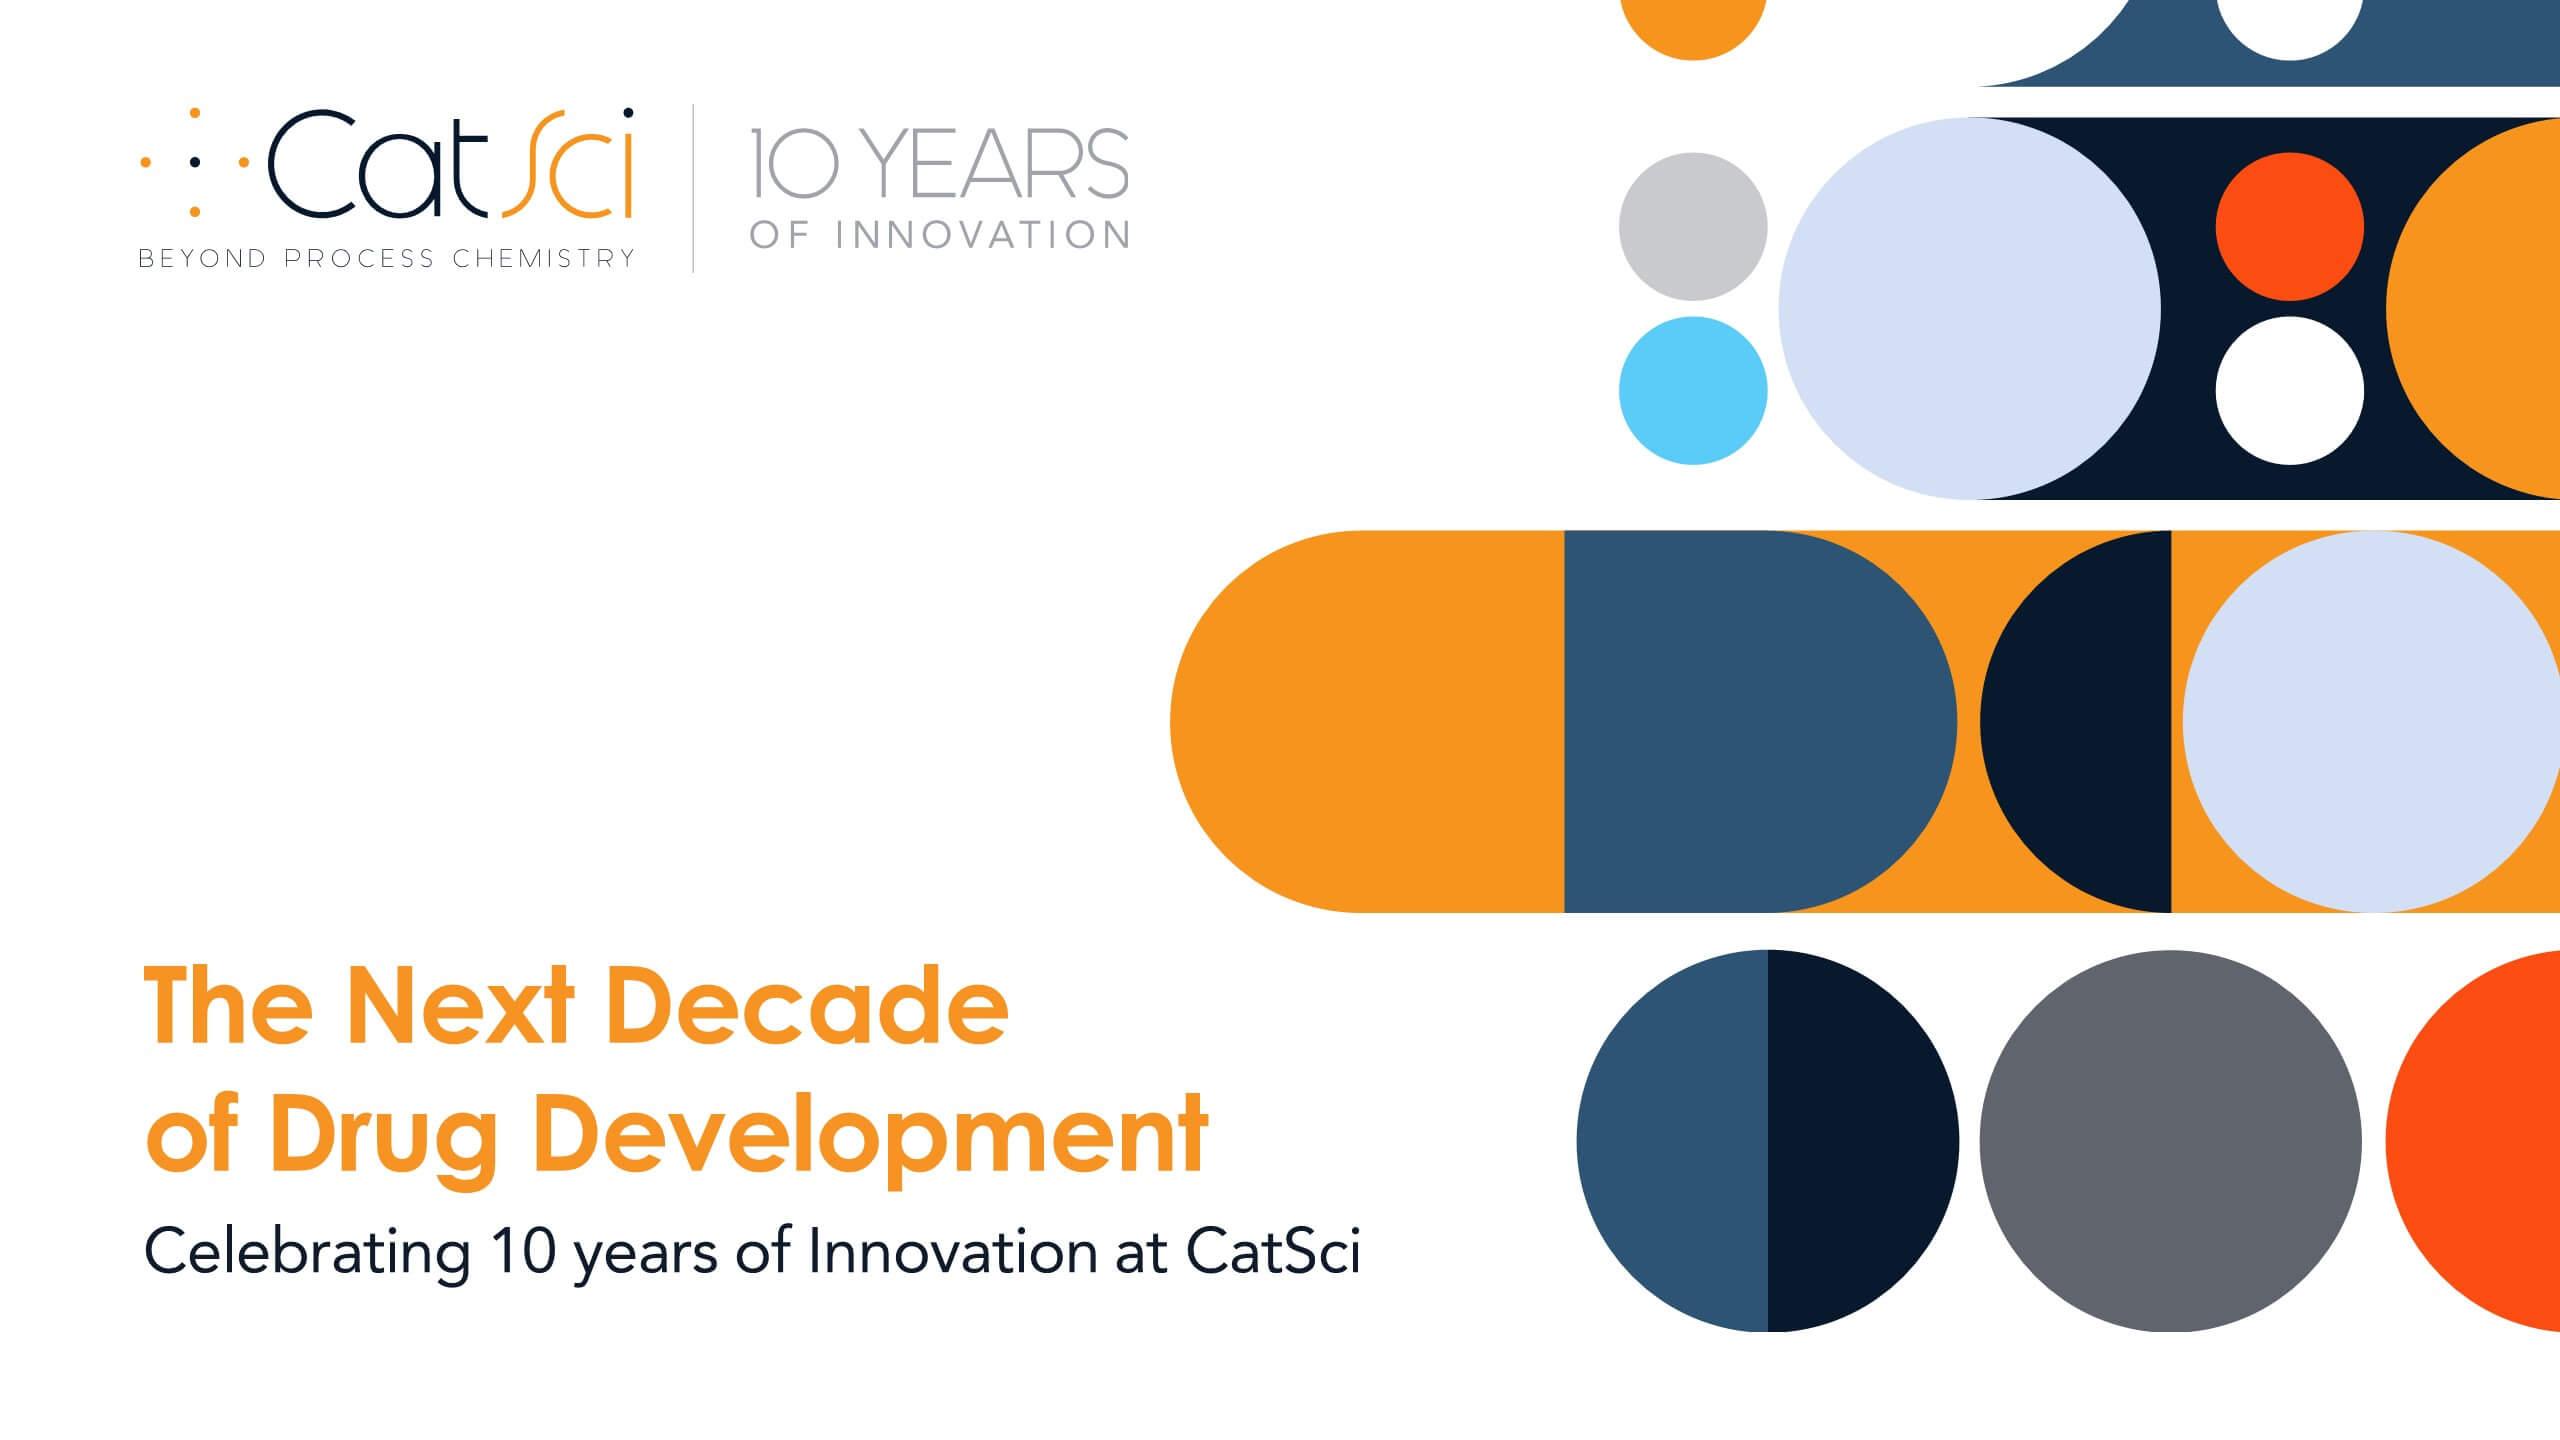 The Next Decade of Drug Development